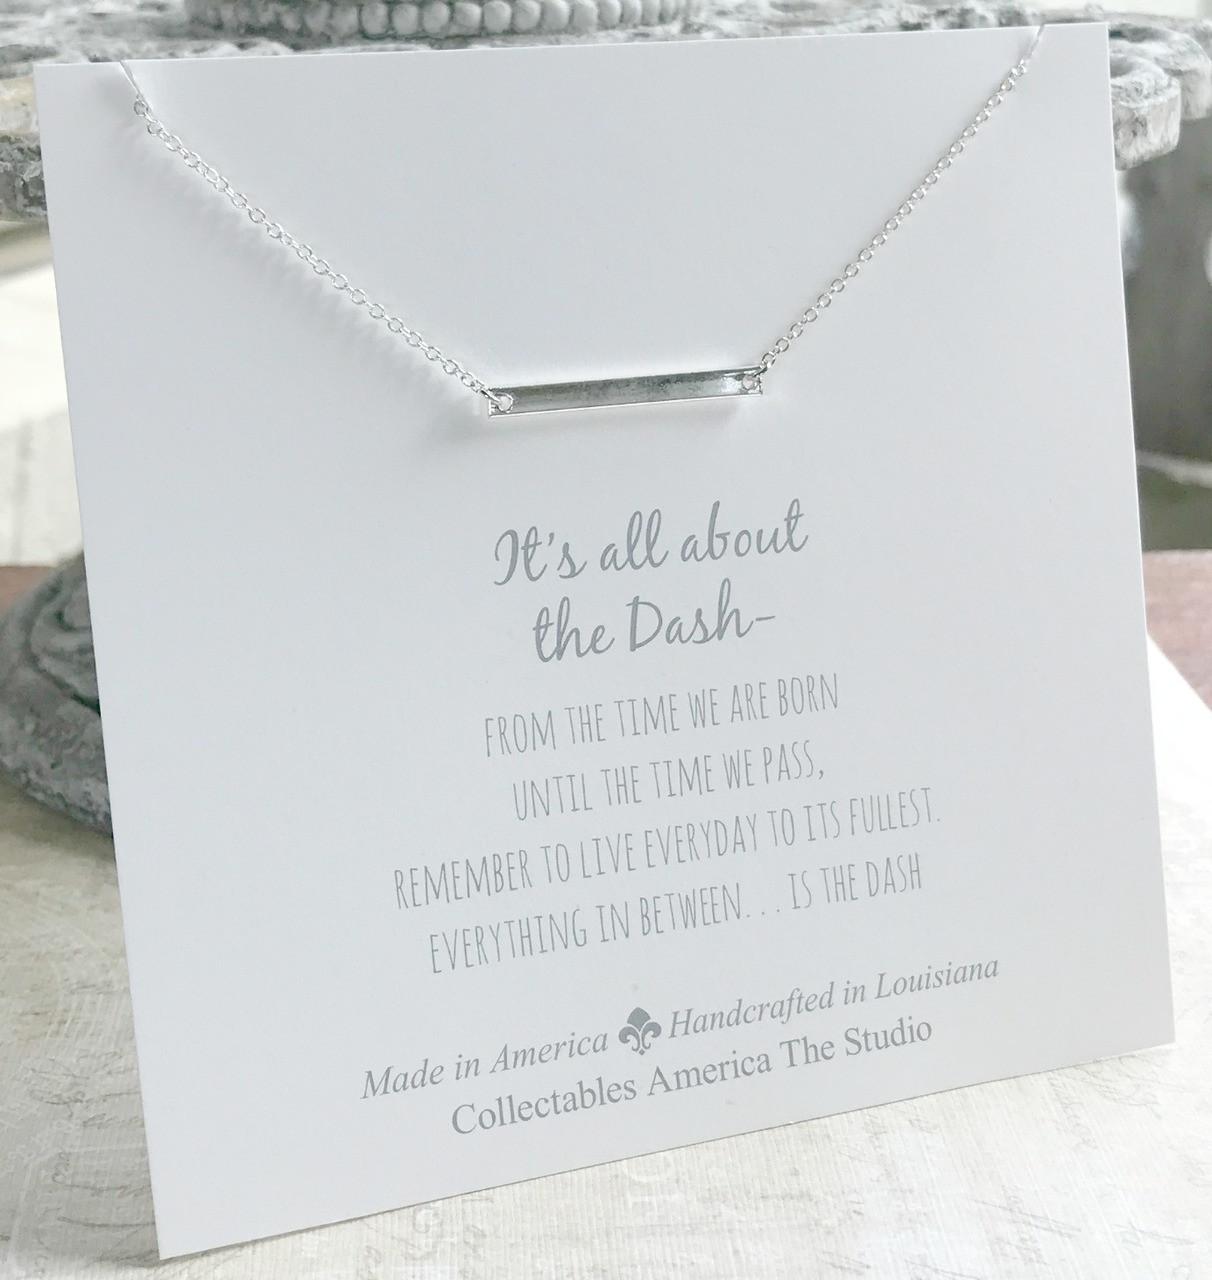 DA-9S Silver Bar All about the Dash Necklace